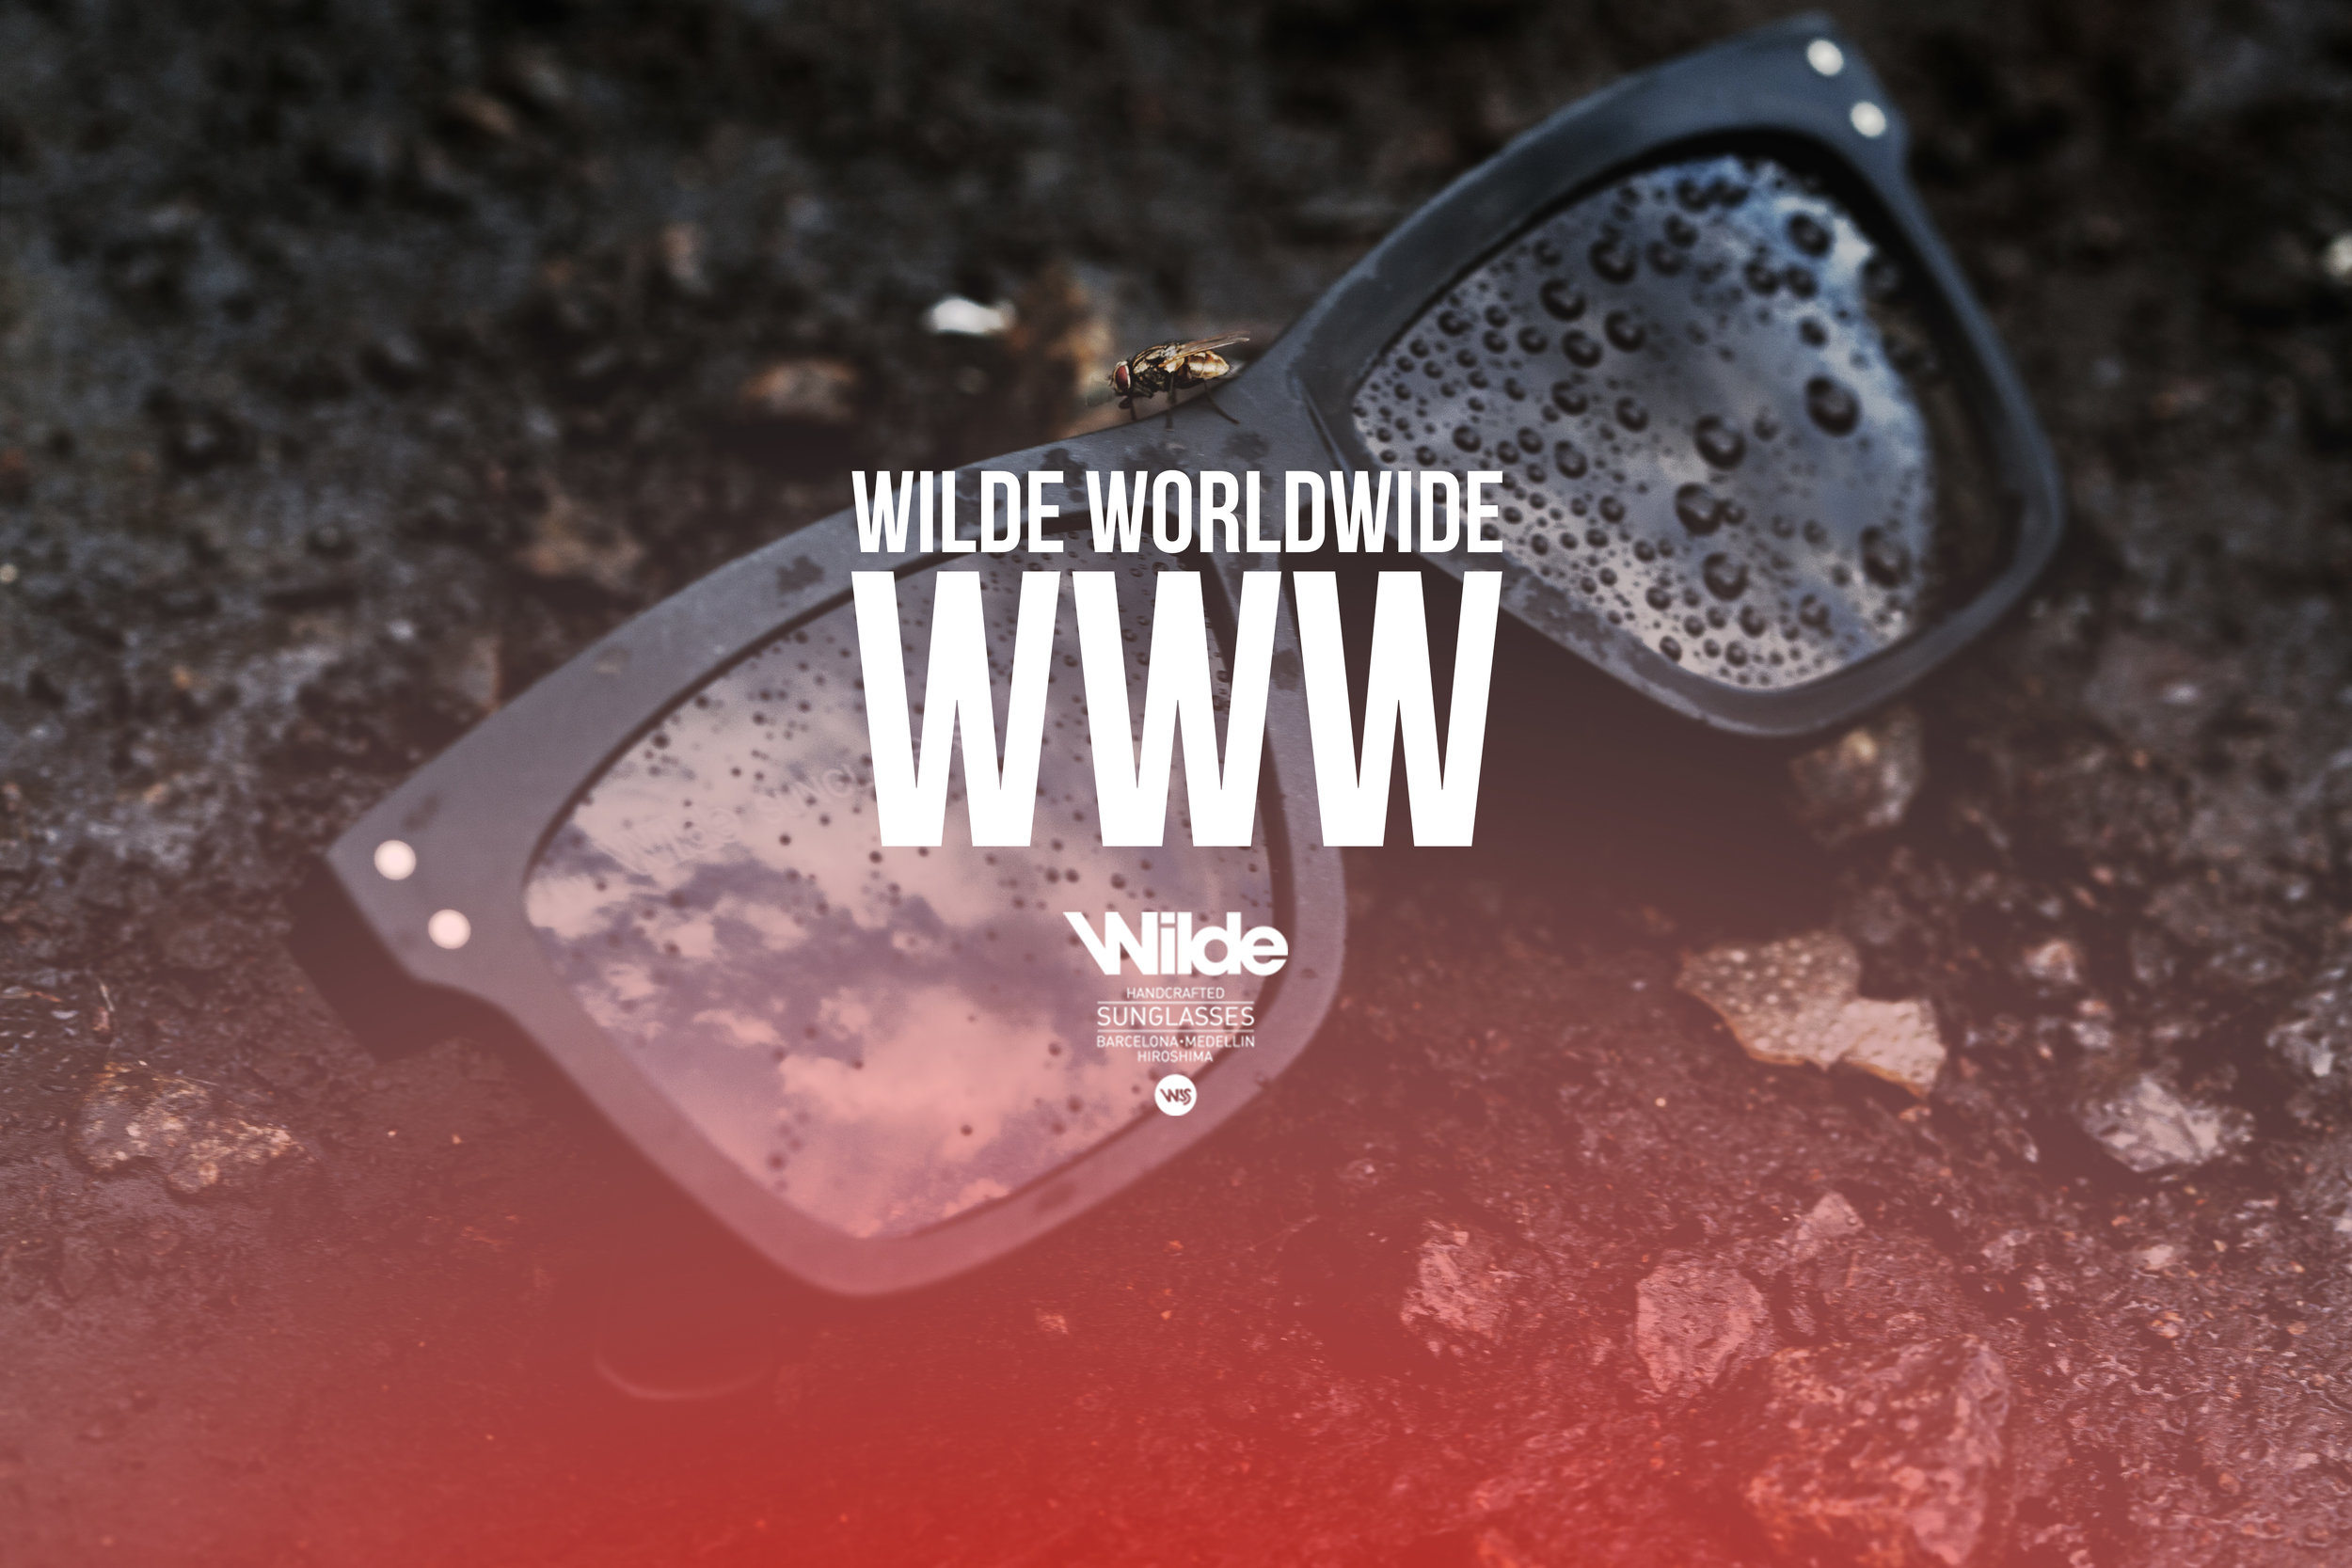 WILDE SUNGLASSES: WILD WORLD WIDE